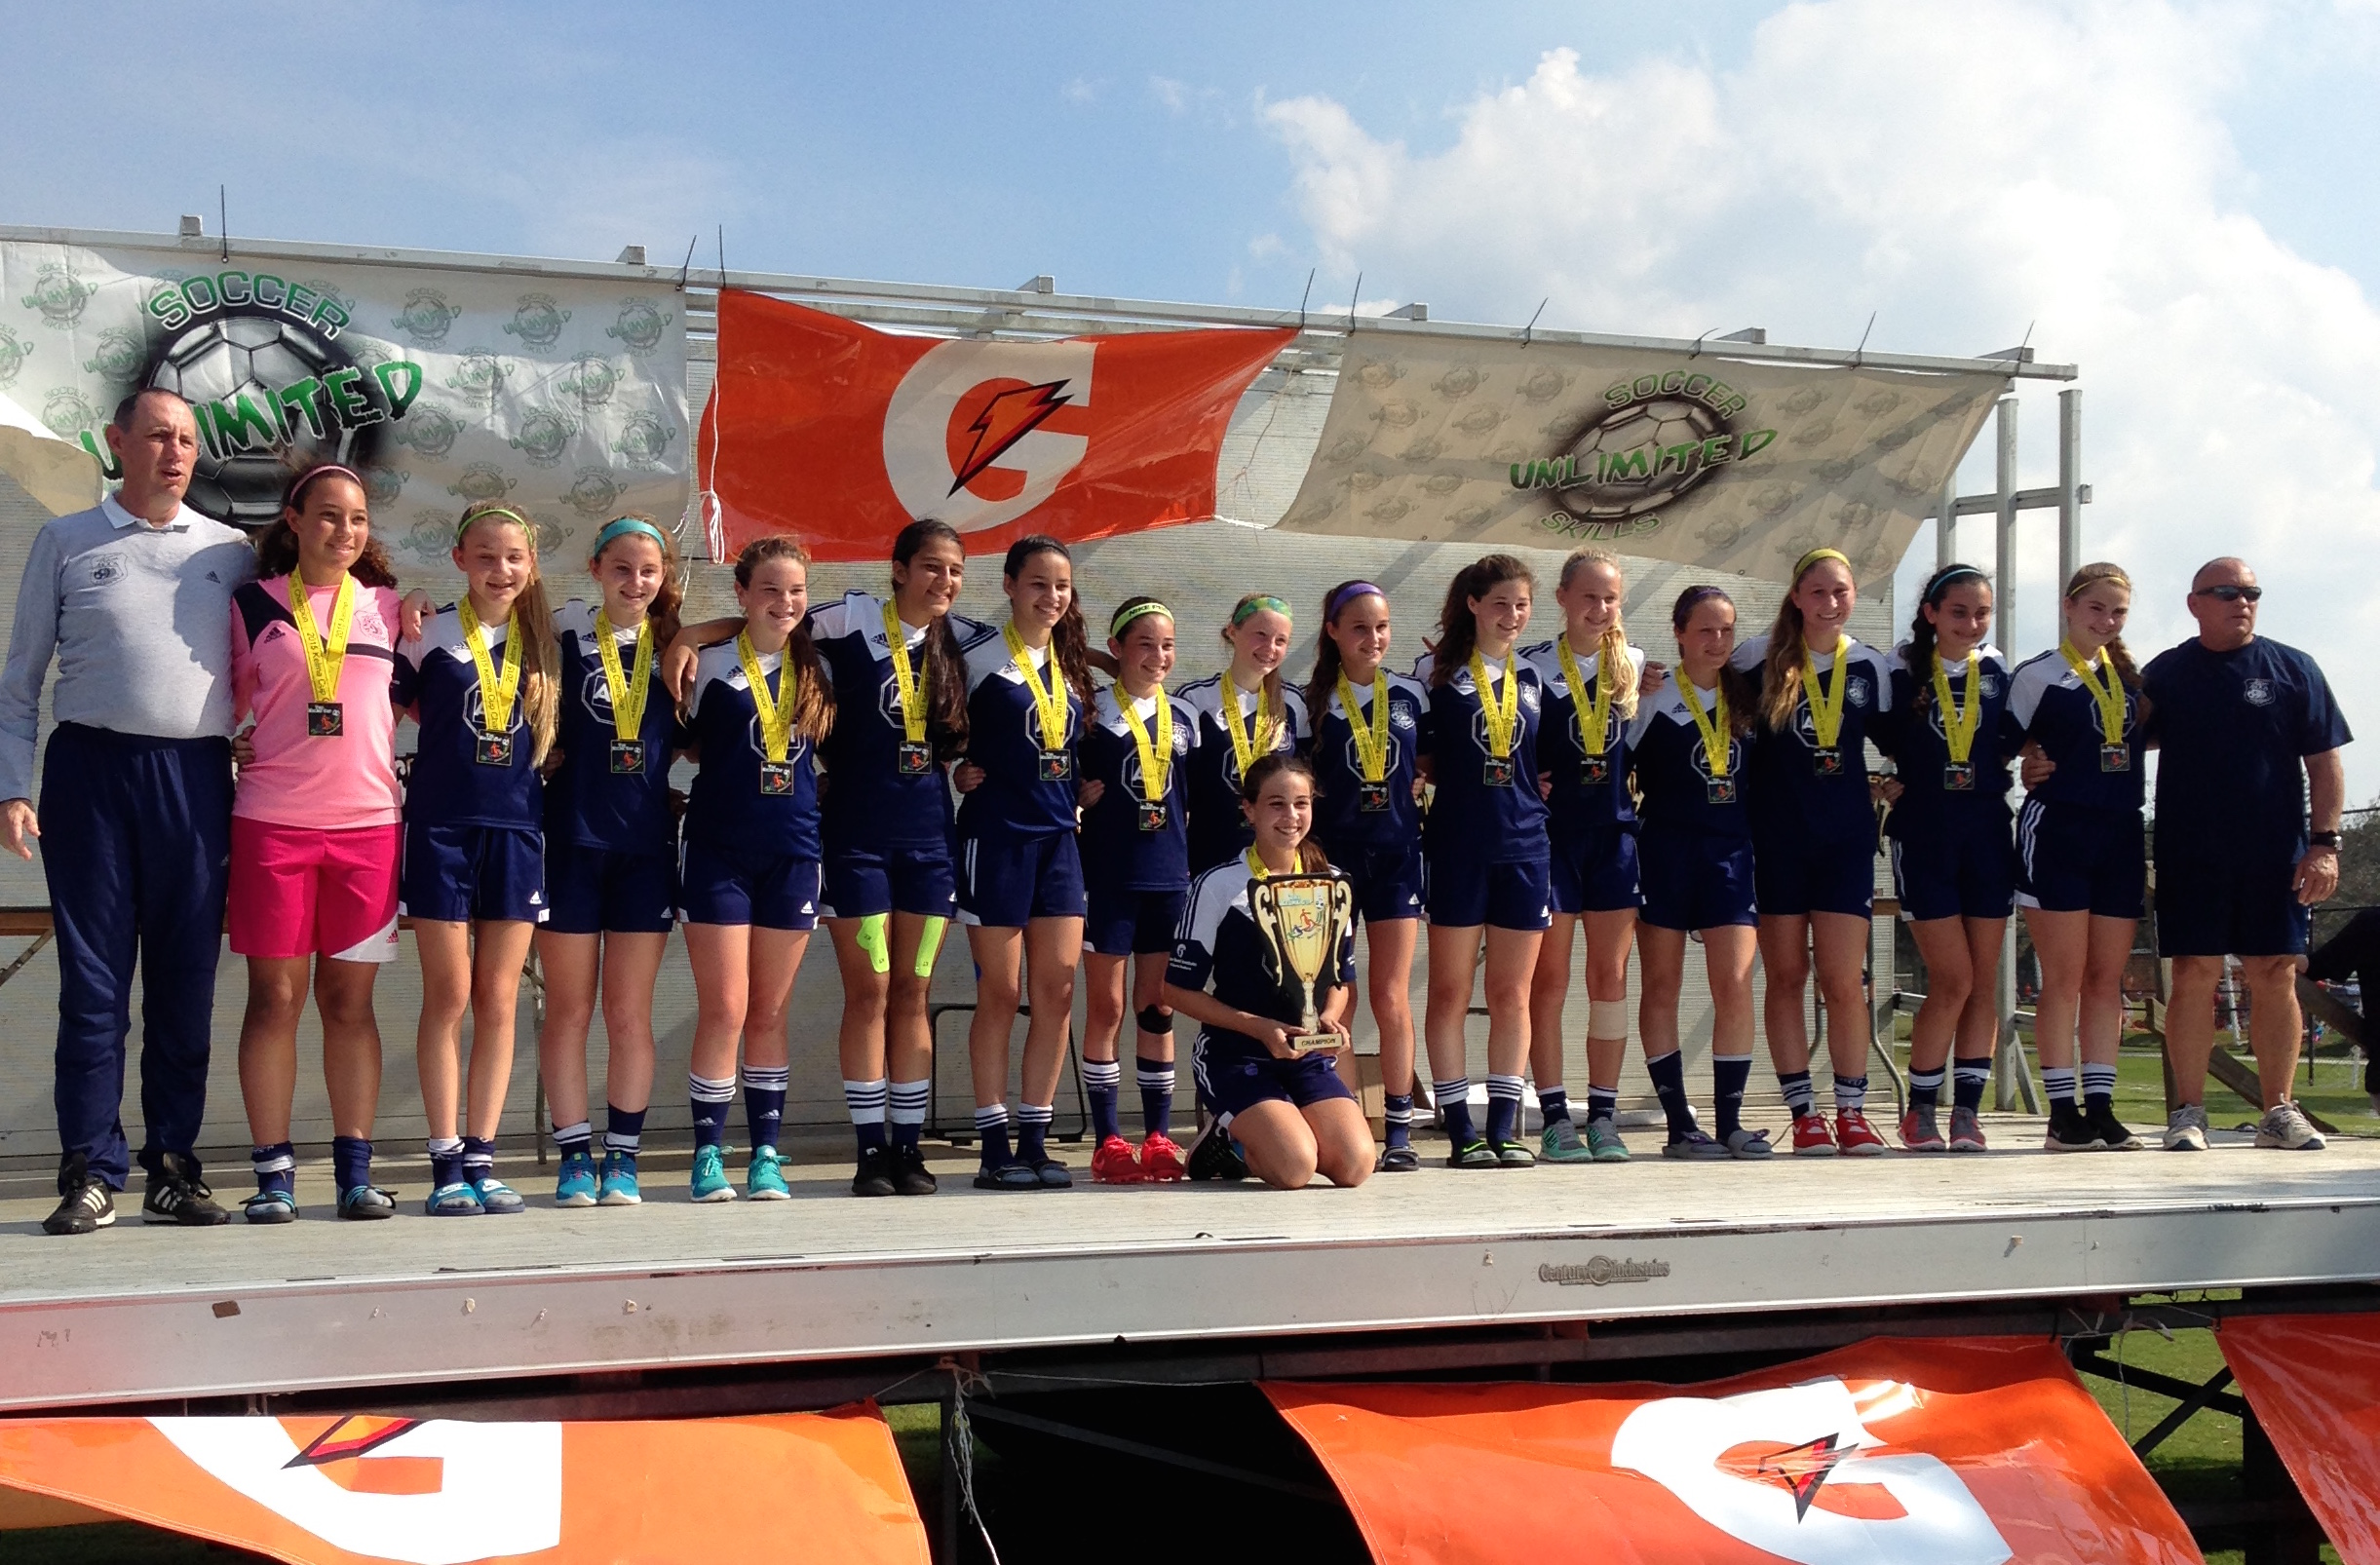 2015 Kelme Cup Champions